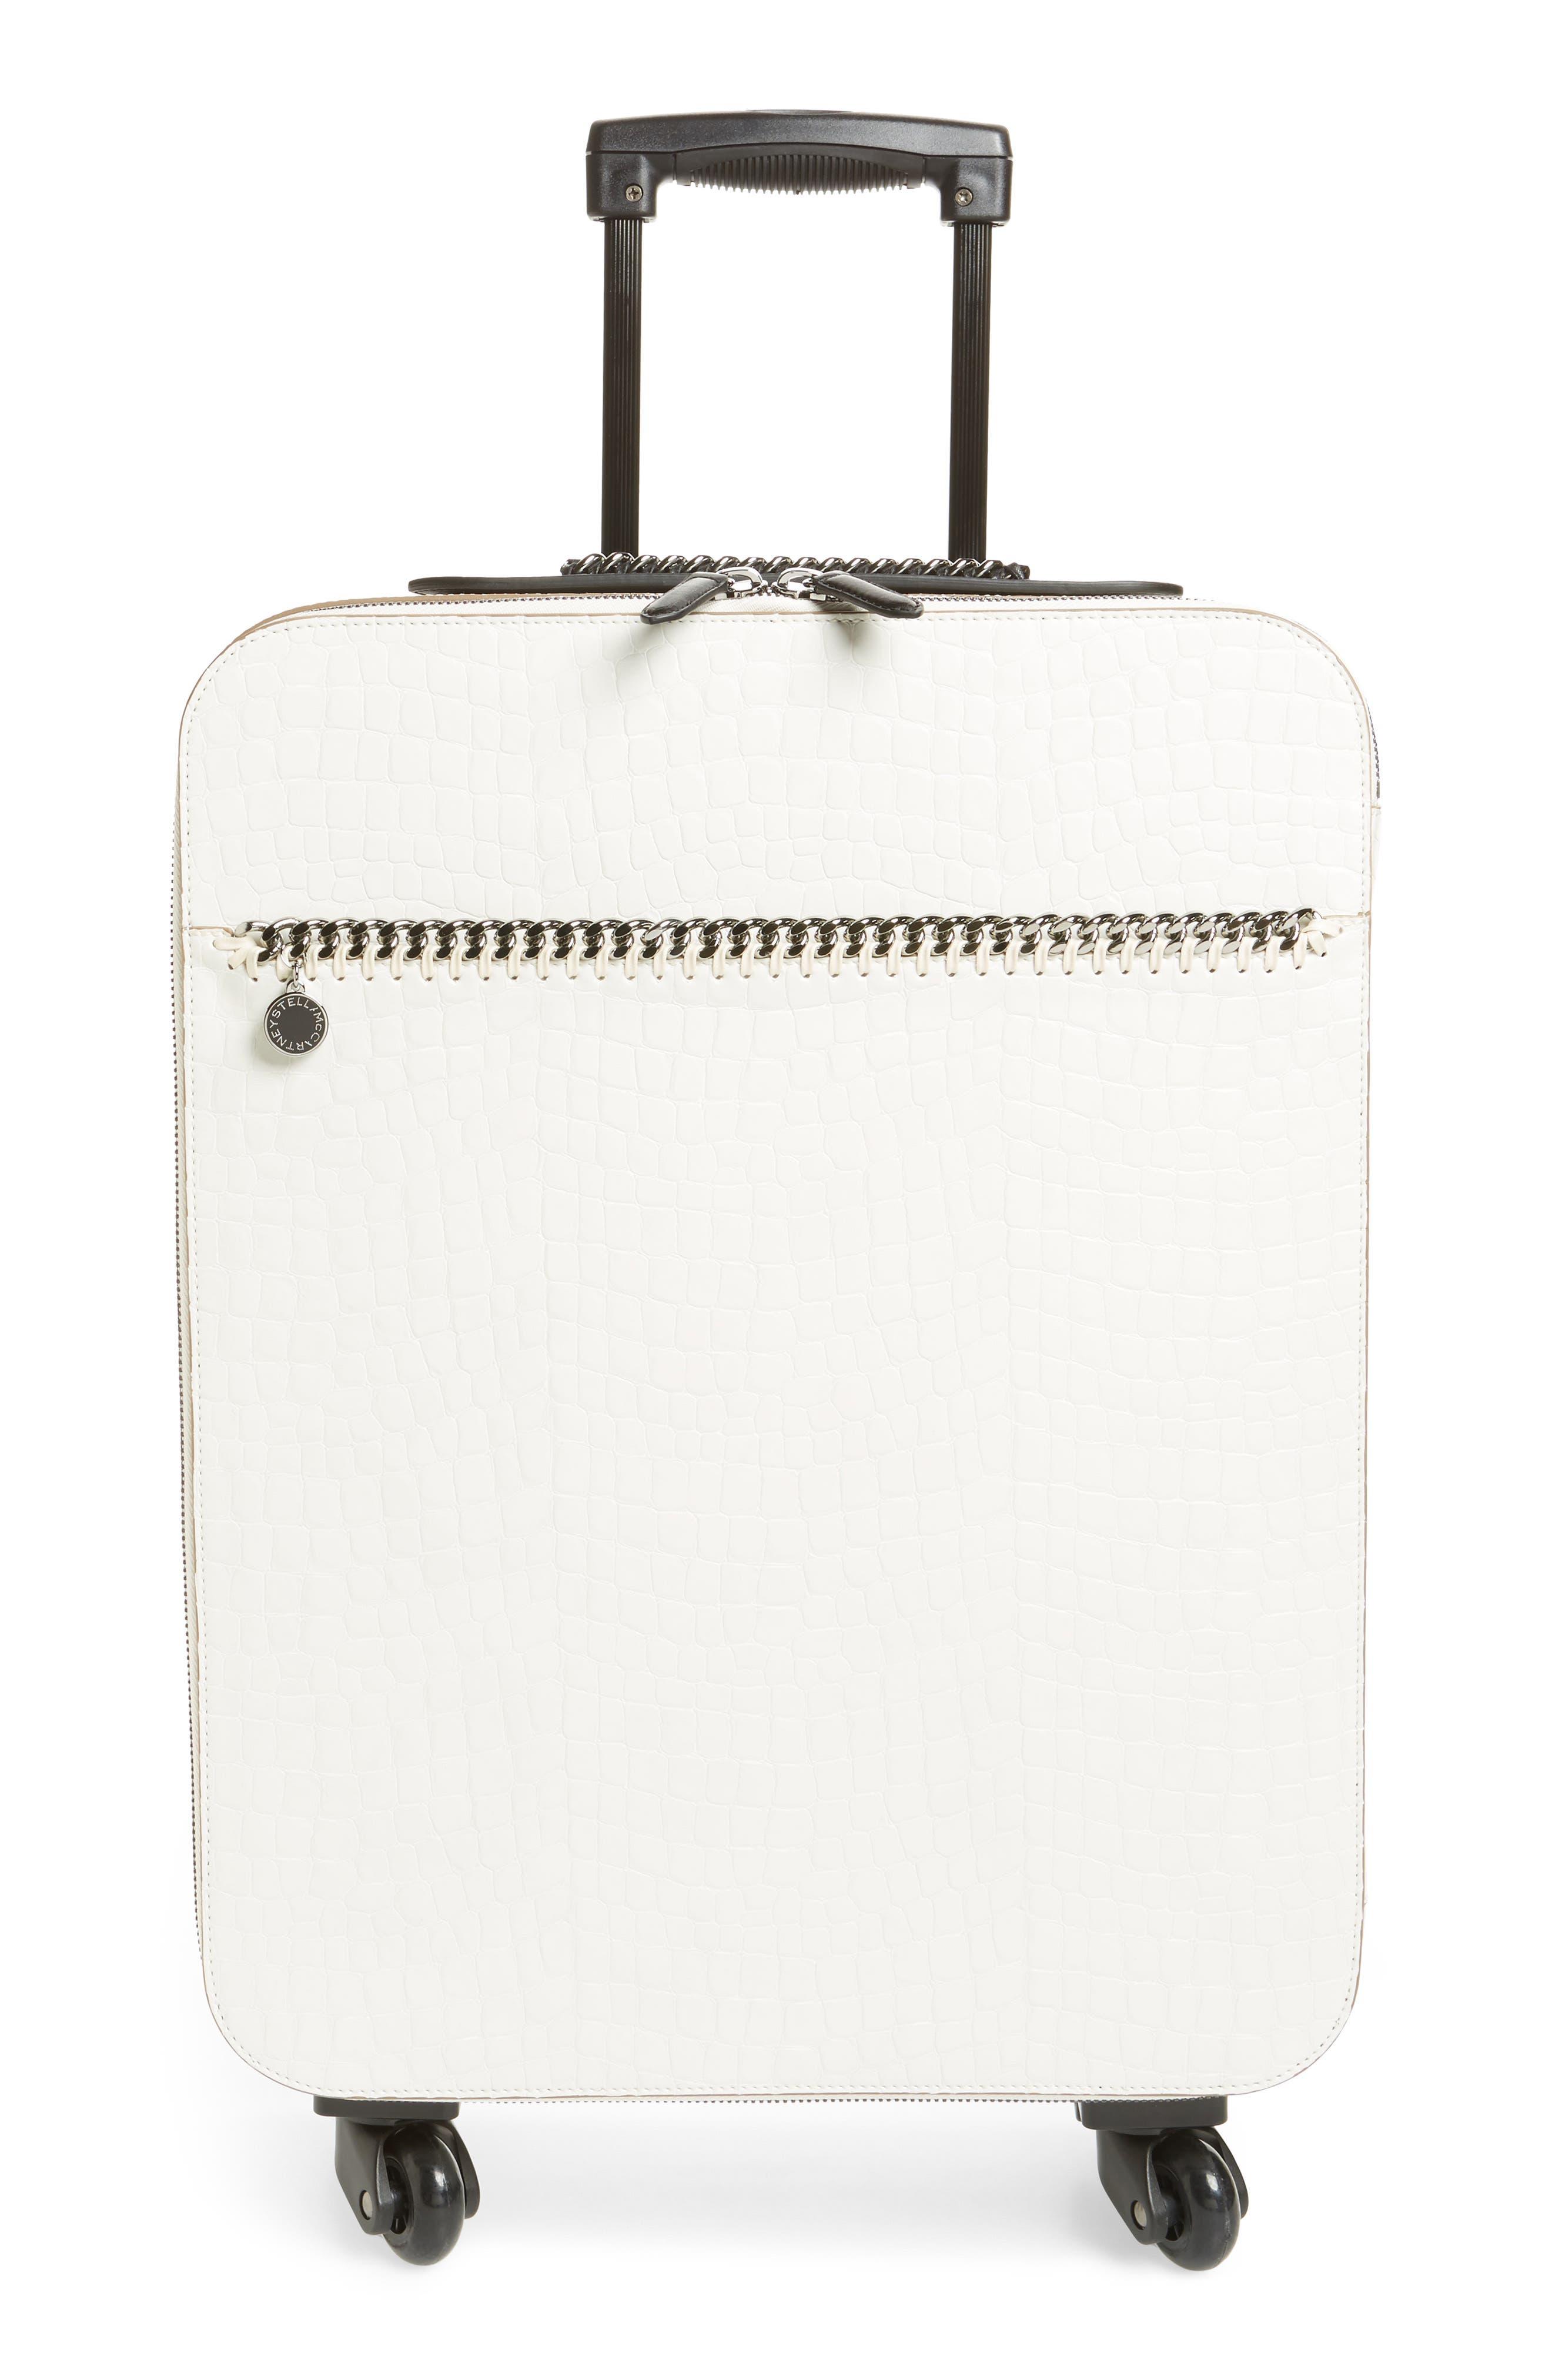 Stella McCartney 20-Inch Alter Croc Faux Leather Trolley Case